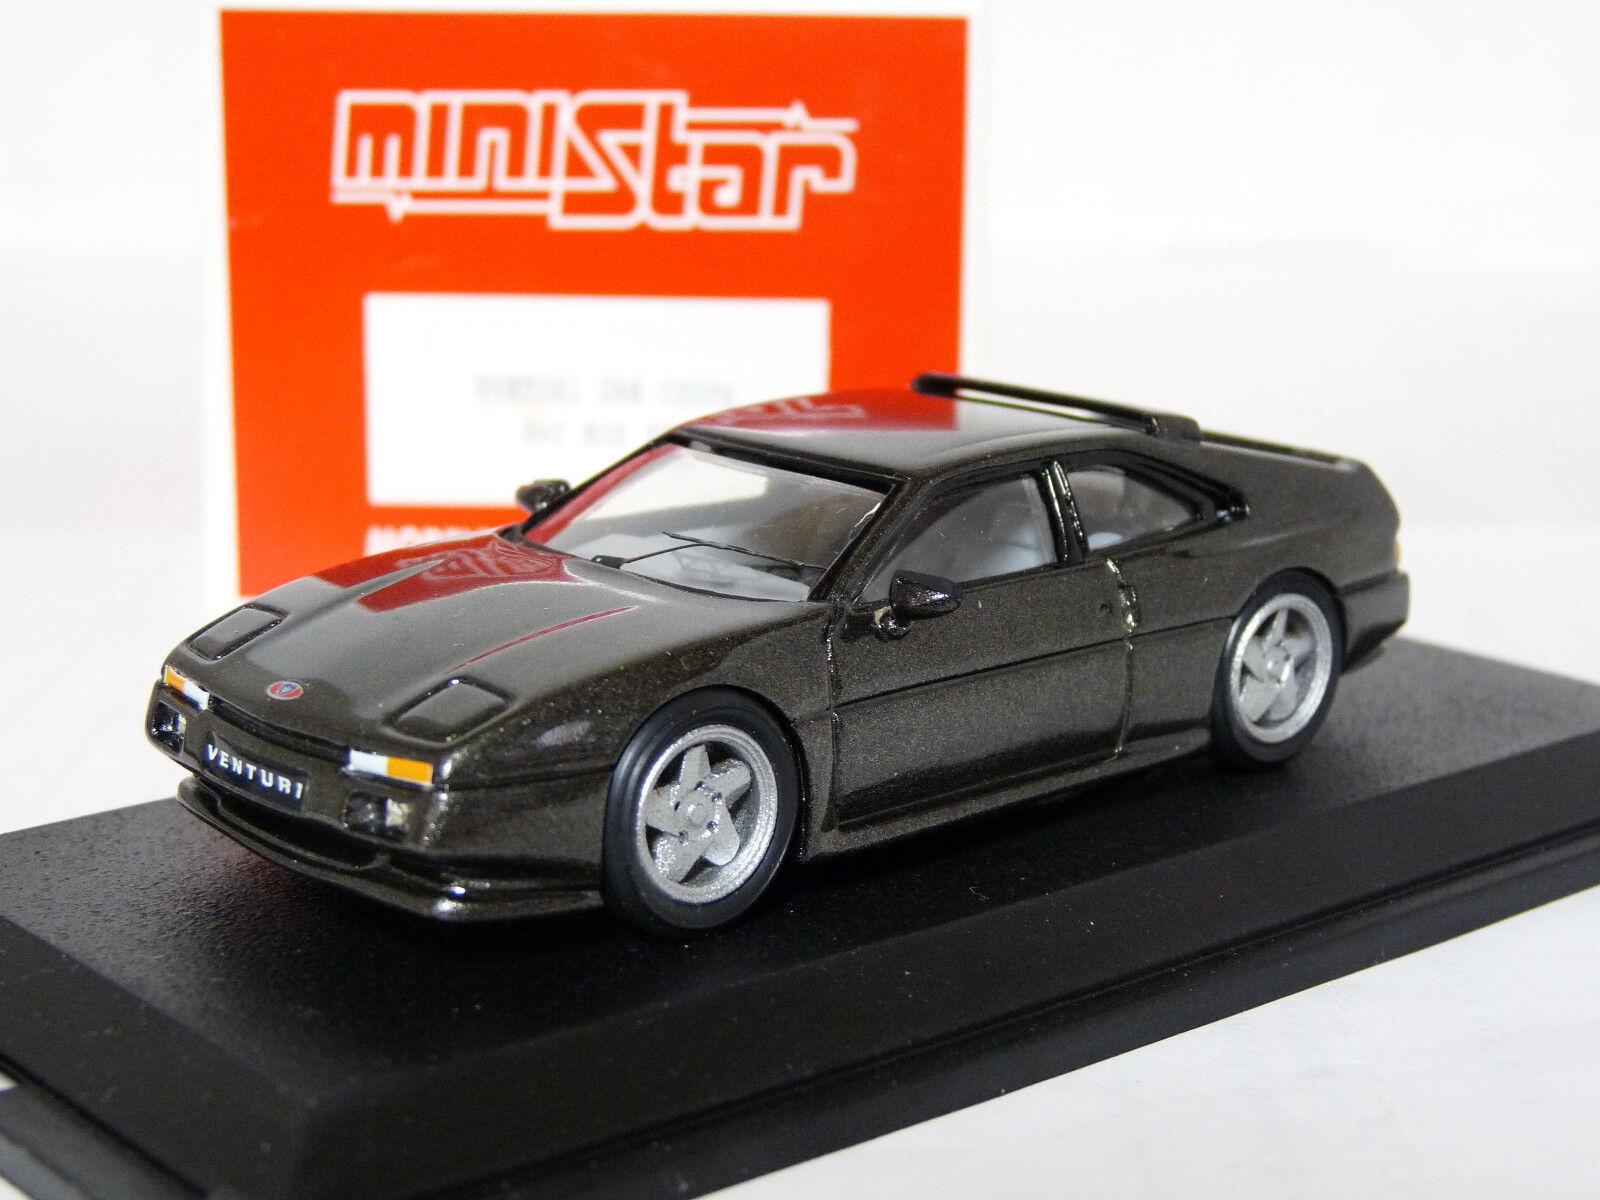 MiniEstrella MSR04 1 43 Venturi 260 Coupe Coche Modelo de Resina Hecho a Mano